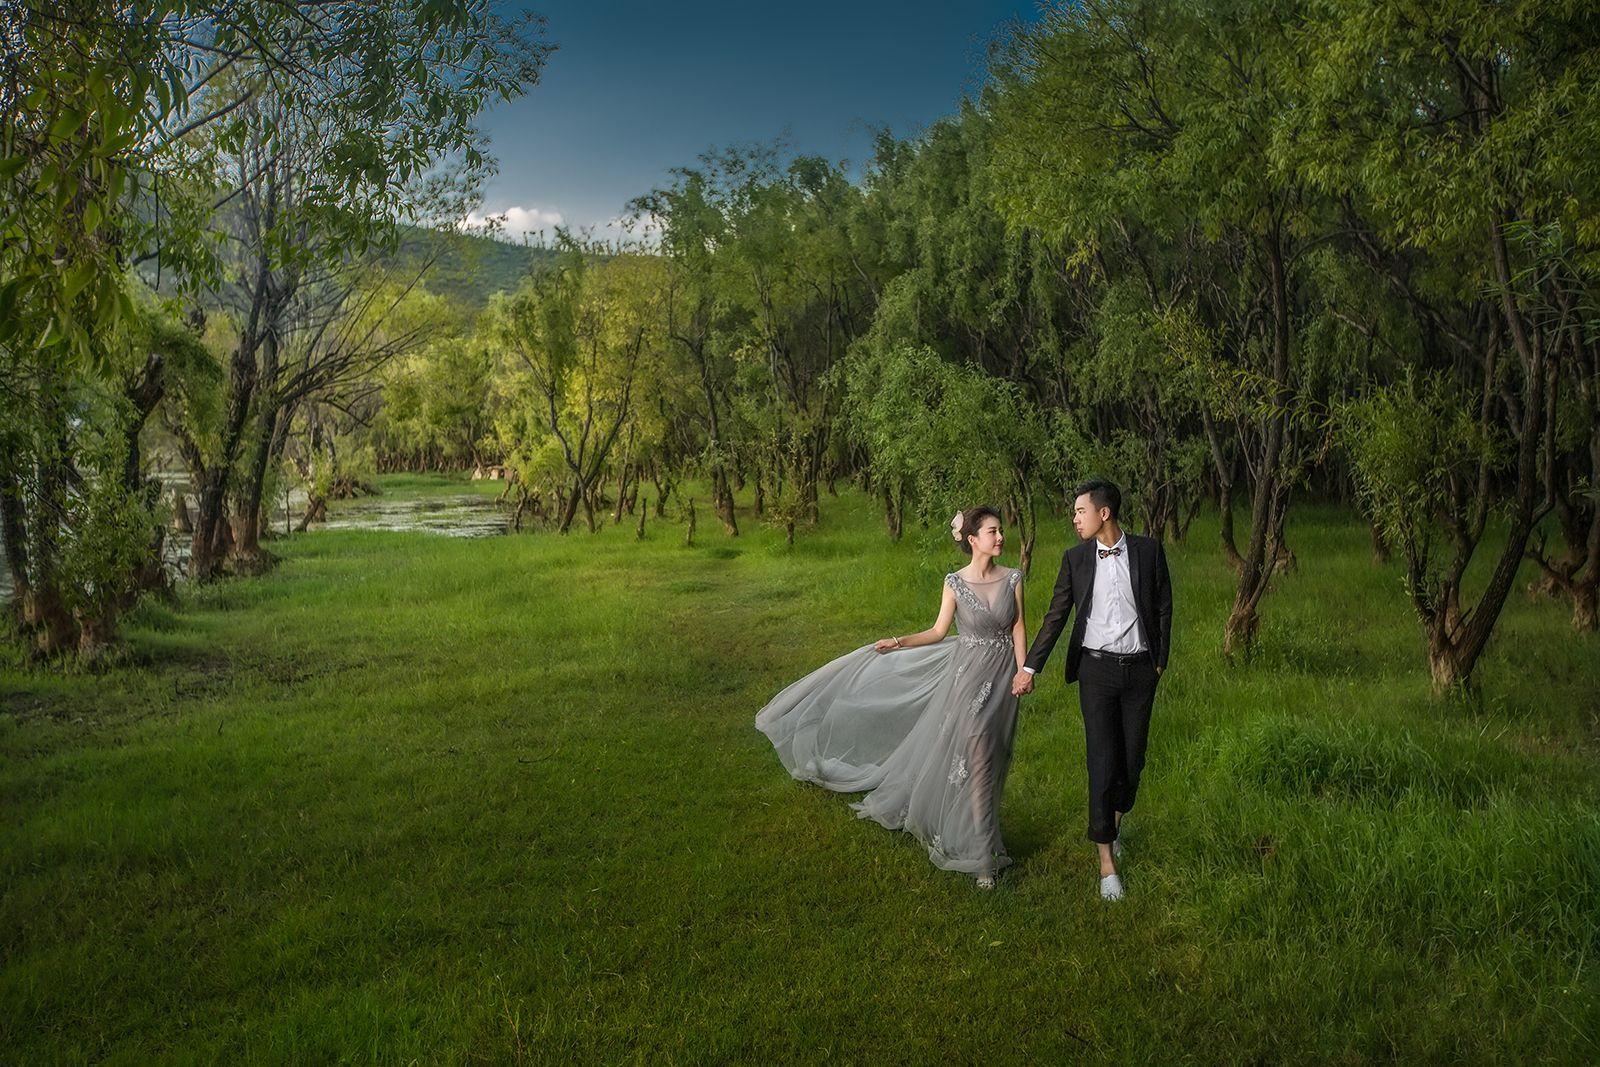 JW Studio婚纱摄影-油画风